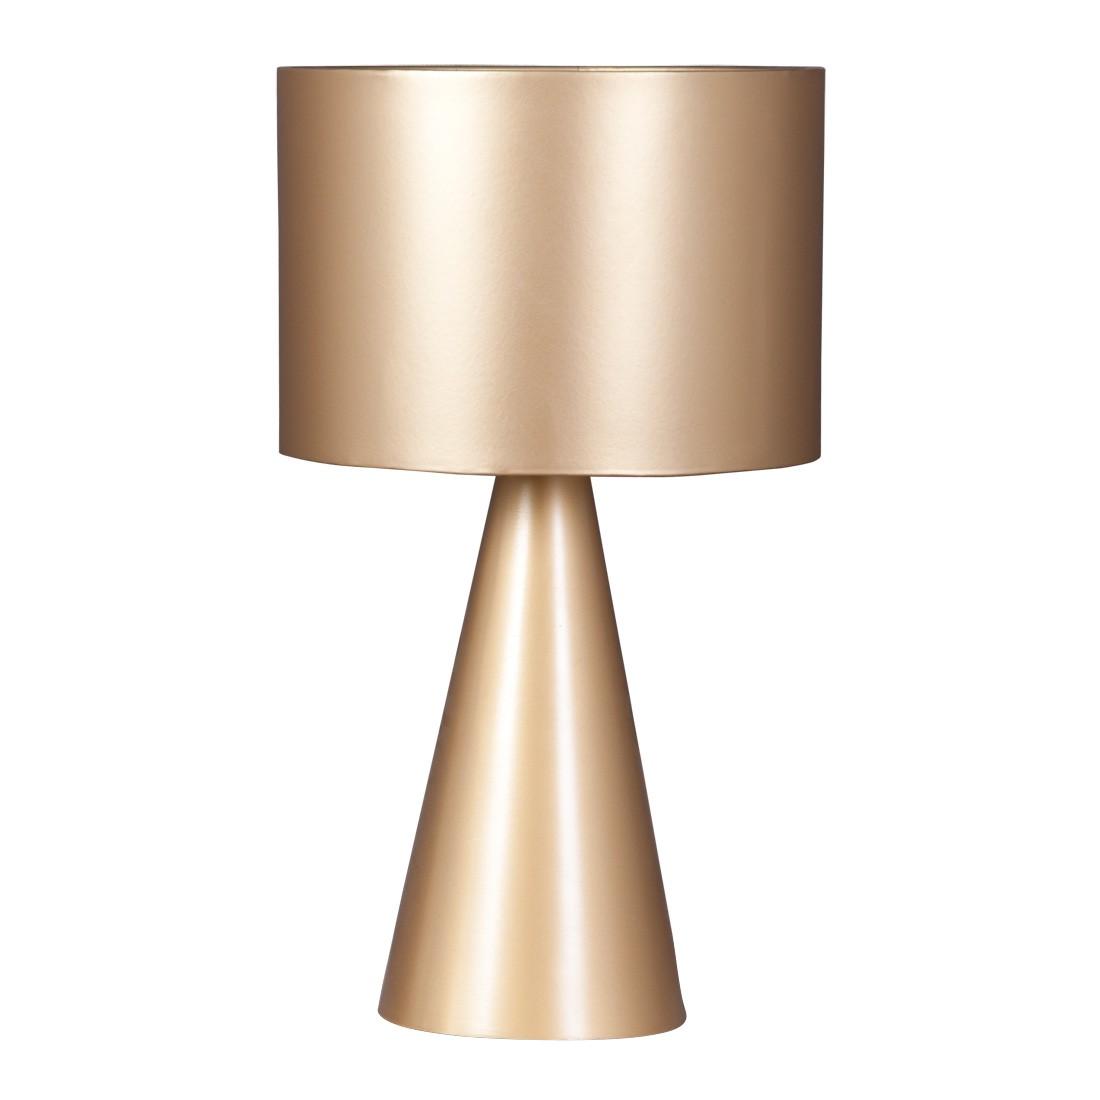 Tischleuchte Cutis ● Kunststoff ● 1-flammig- Furnitive A++